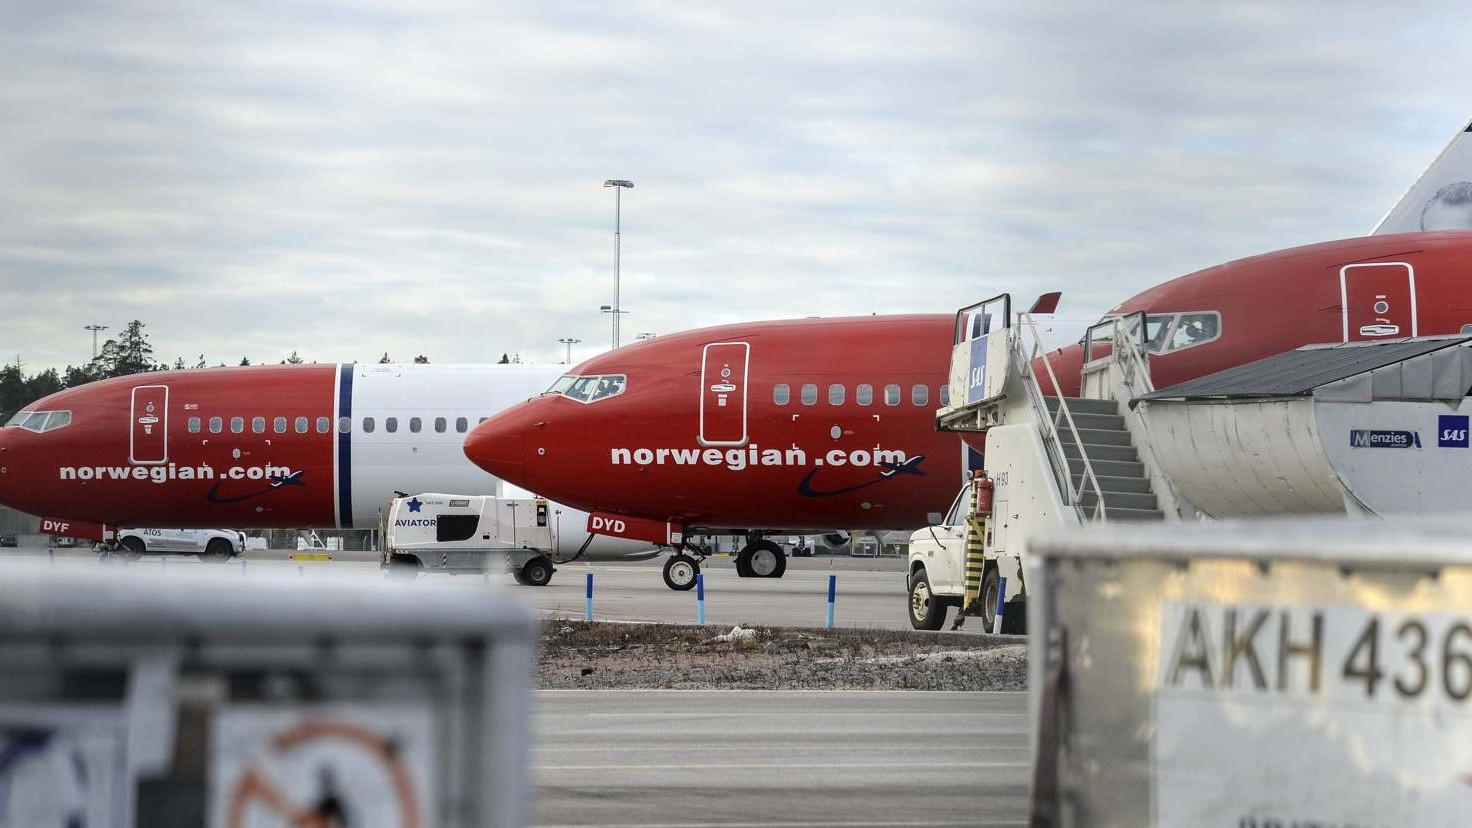 Norwegian Air shares surge on Airbus fleet deal